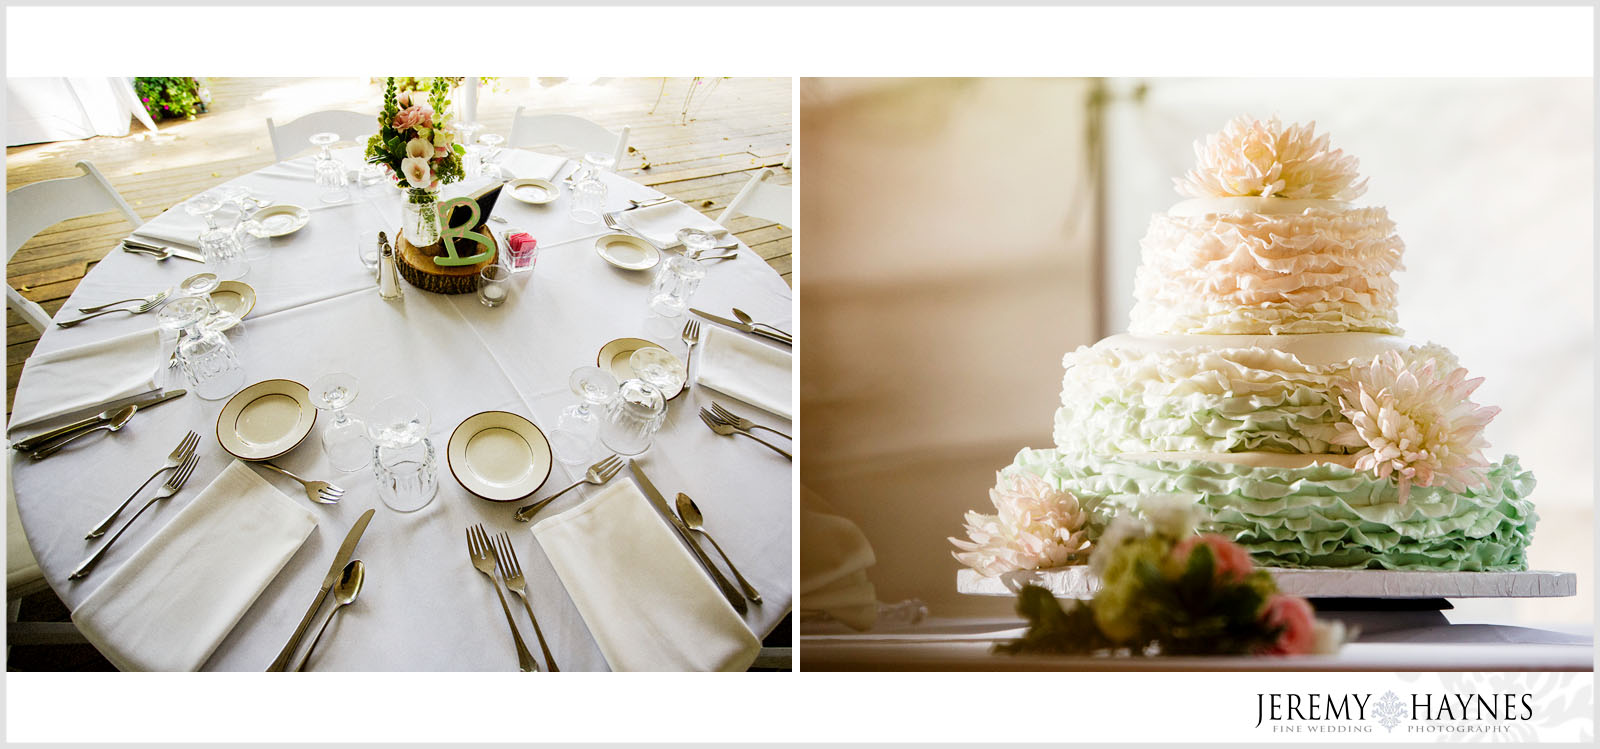 17-the-mansion-at-oak-hill-carmel-indianapolis-wedding-cake-creative-natural-photographer.jpg